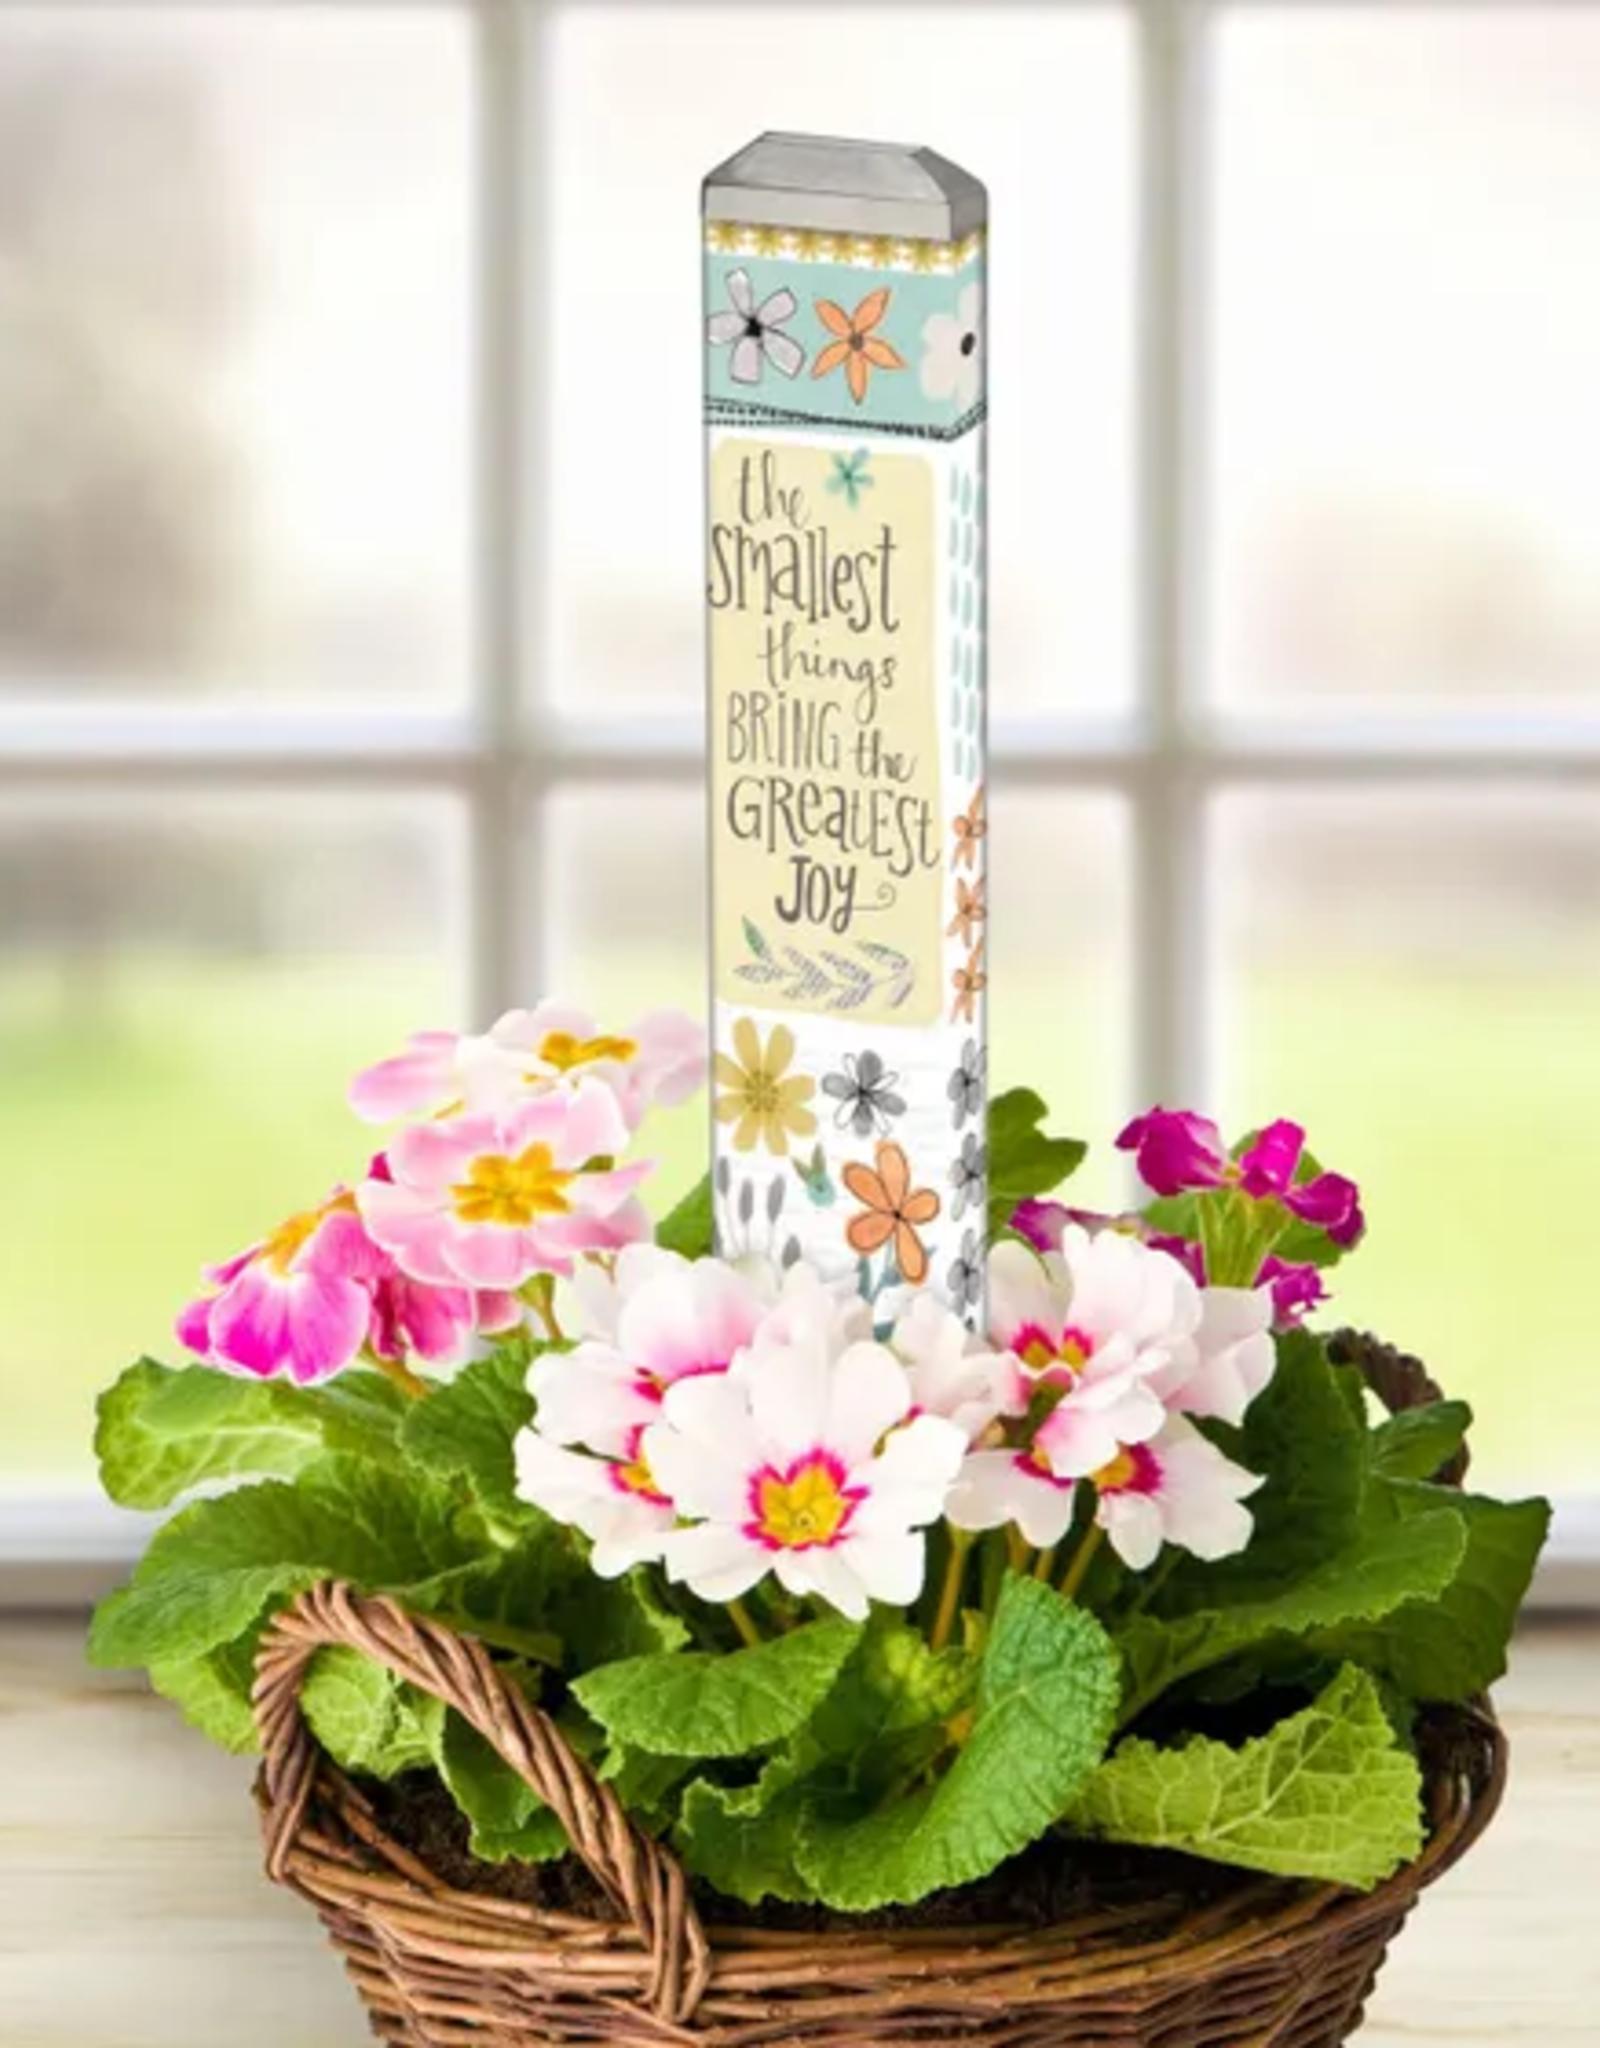 "Studio M Mini Art Pole 13"", Smallest Things"